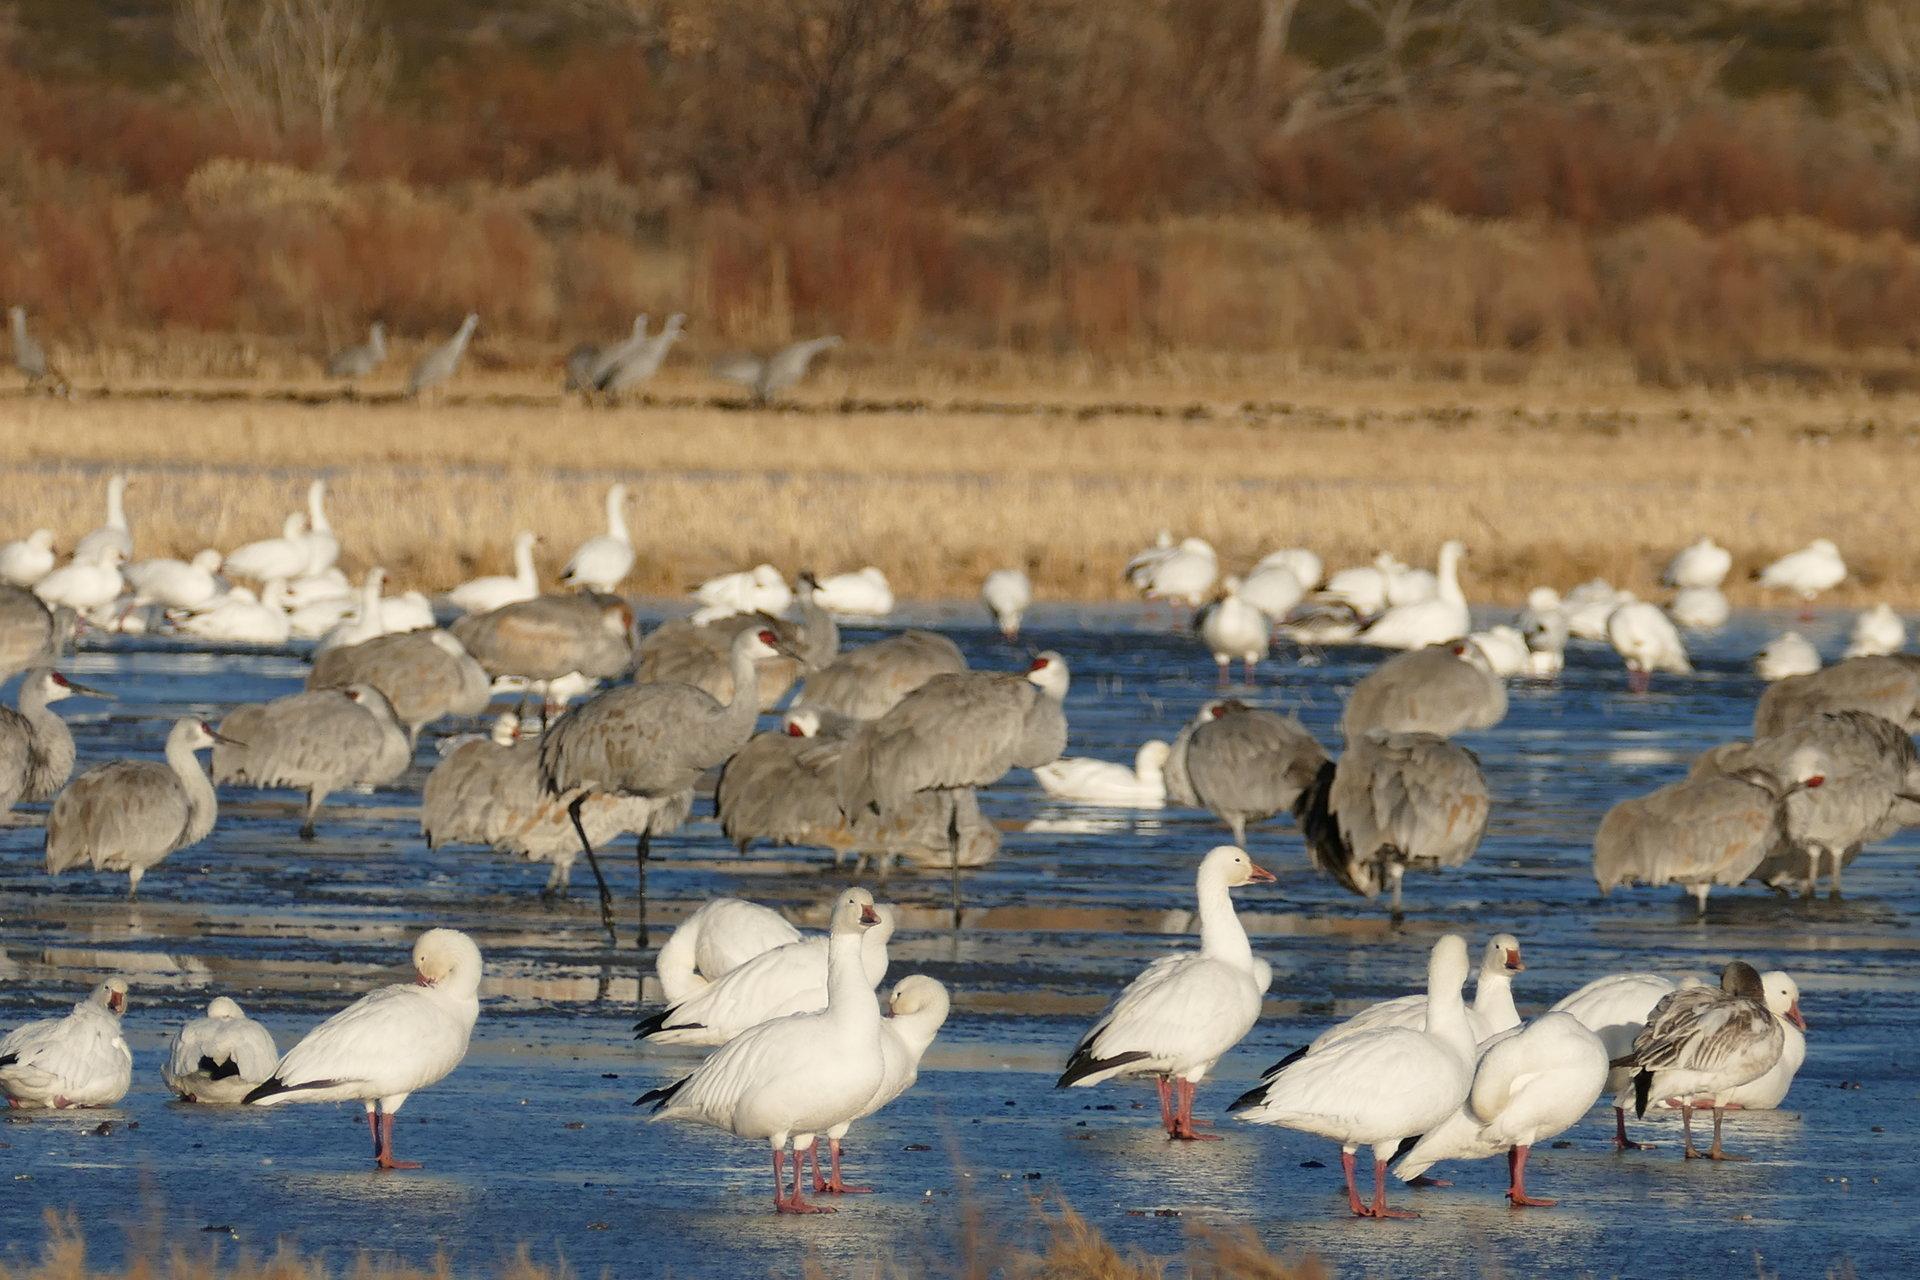 Snow geese and sandhill cranes   Author daniela damgova - dd   PHOTO FORUM